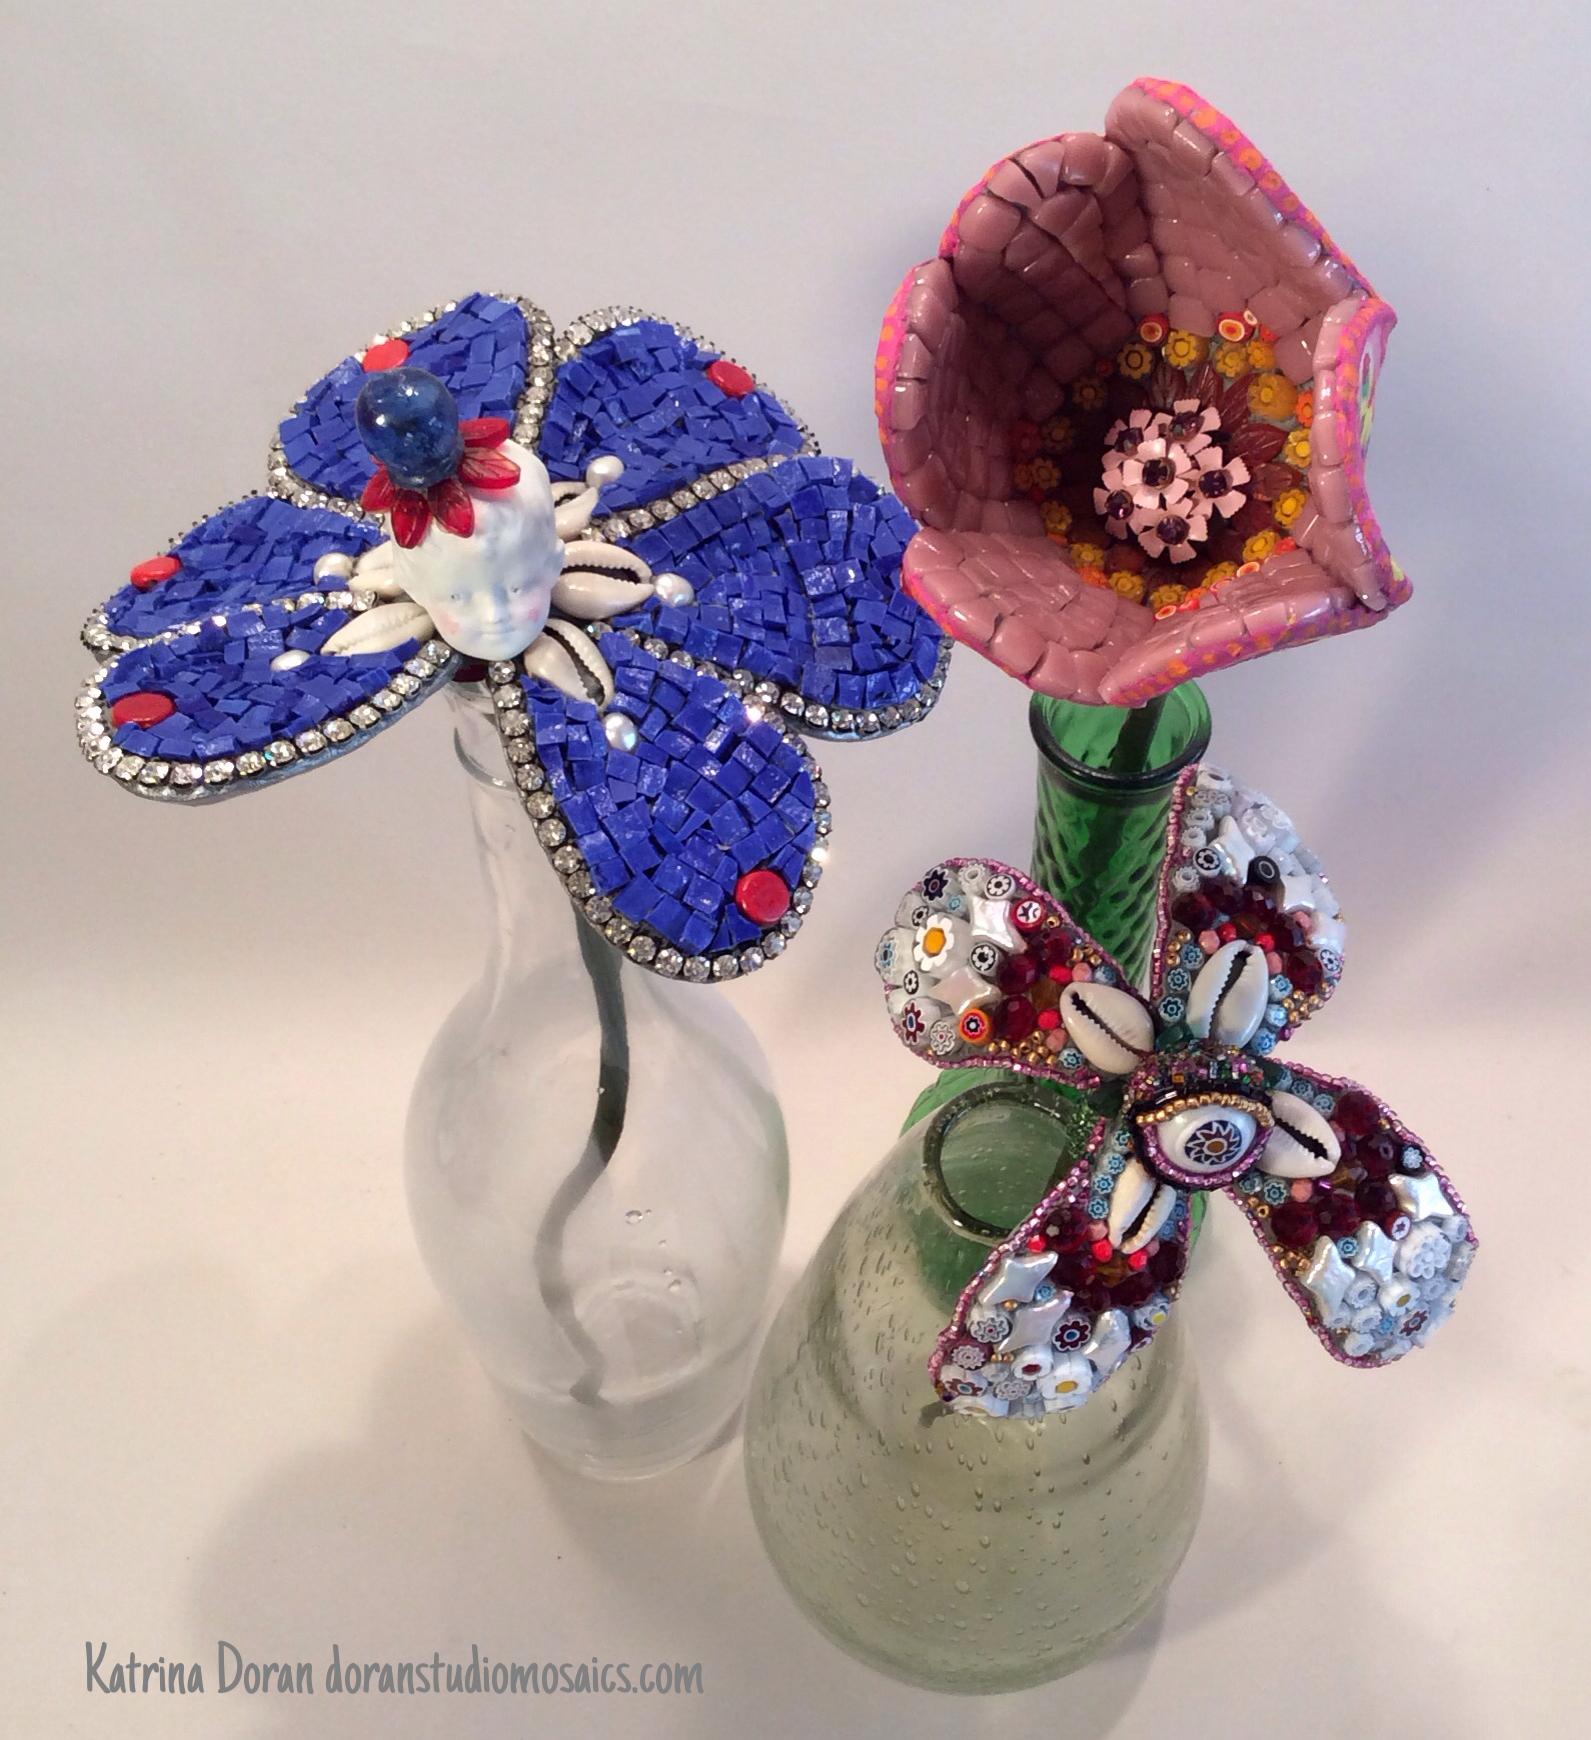 Petite Fleurs - Bejeweled Mosaic Flower Workshop with Katrina Doran